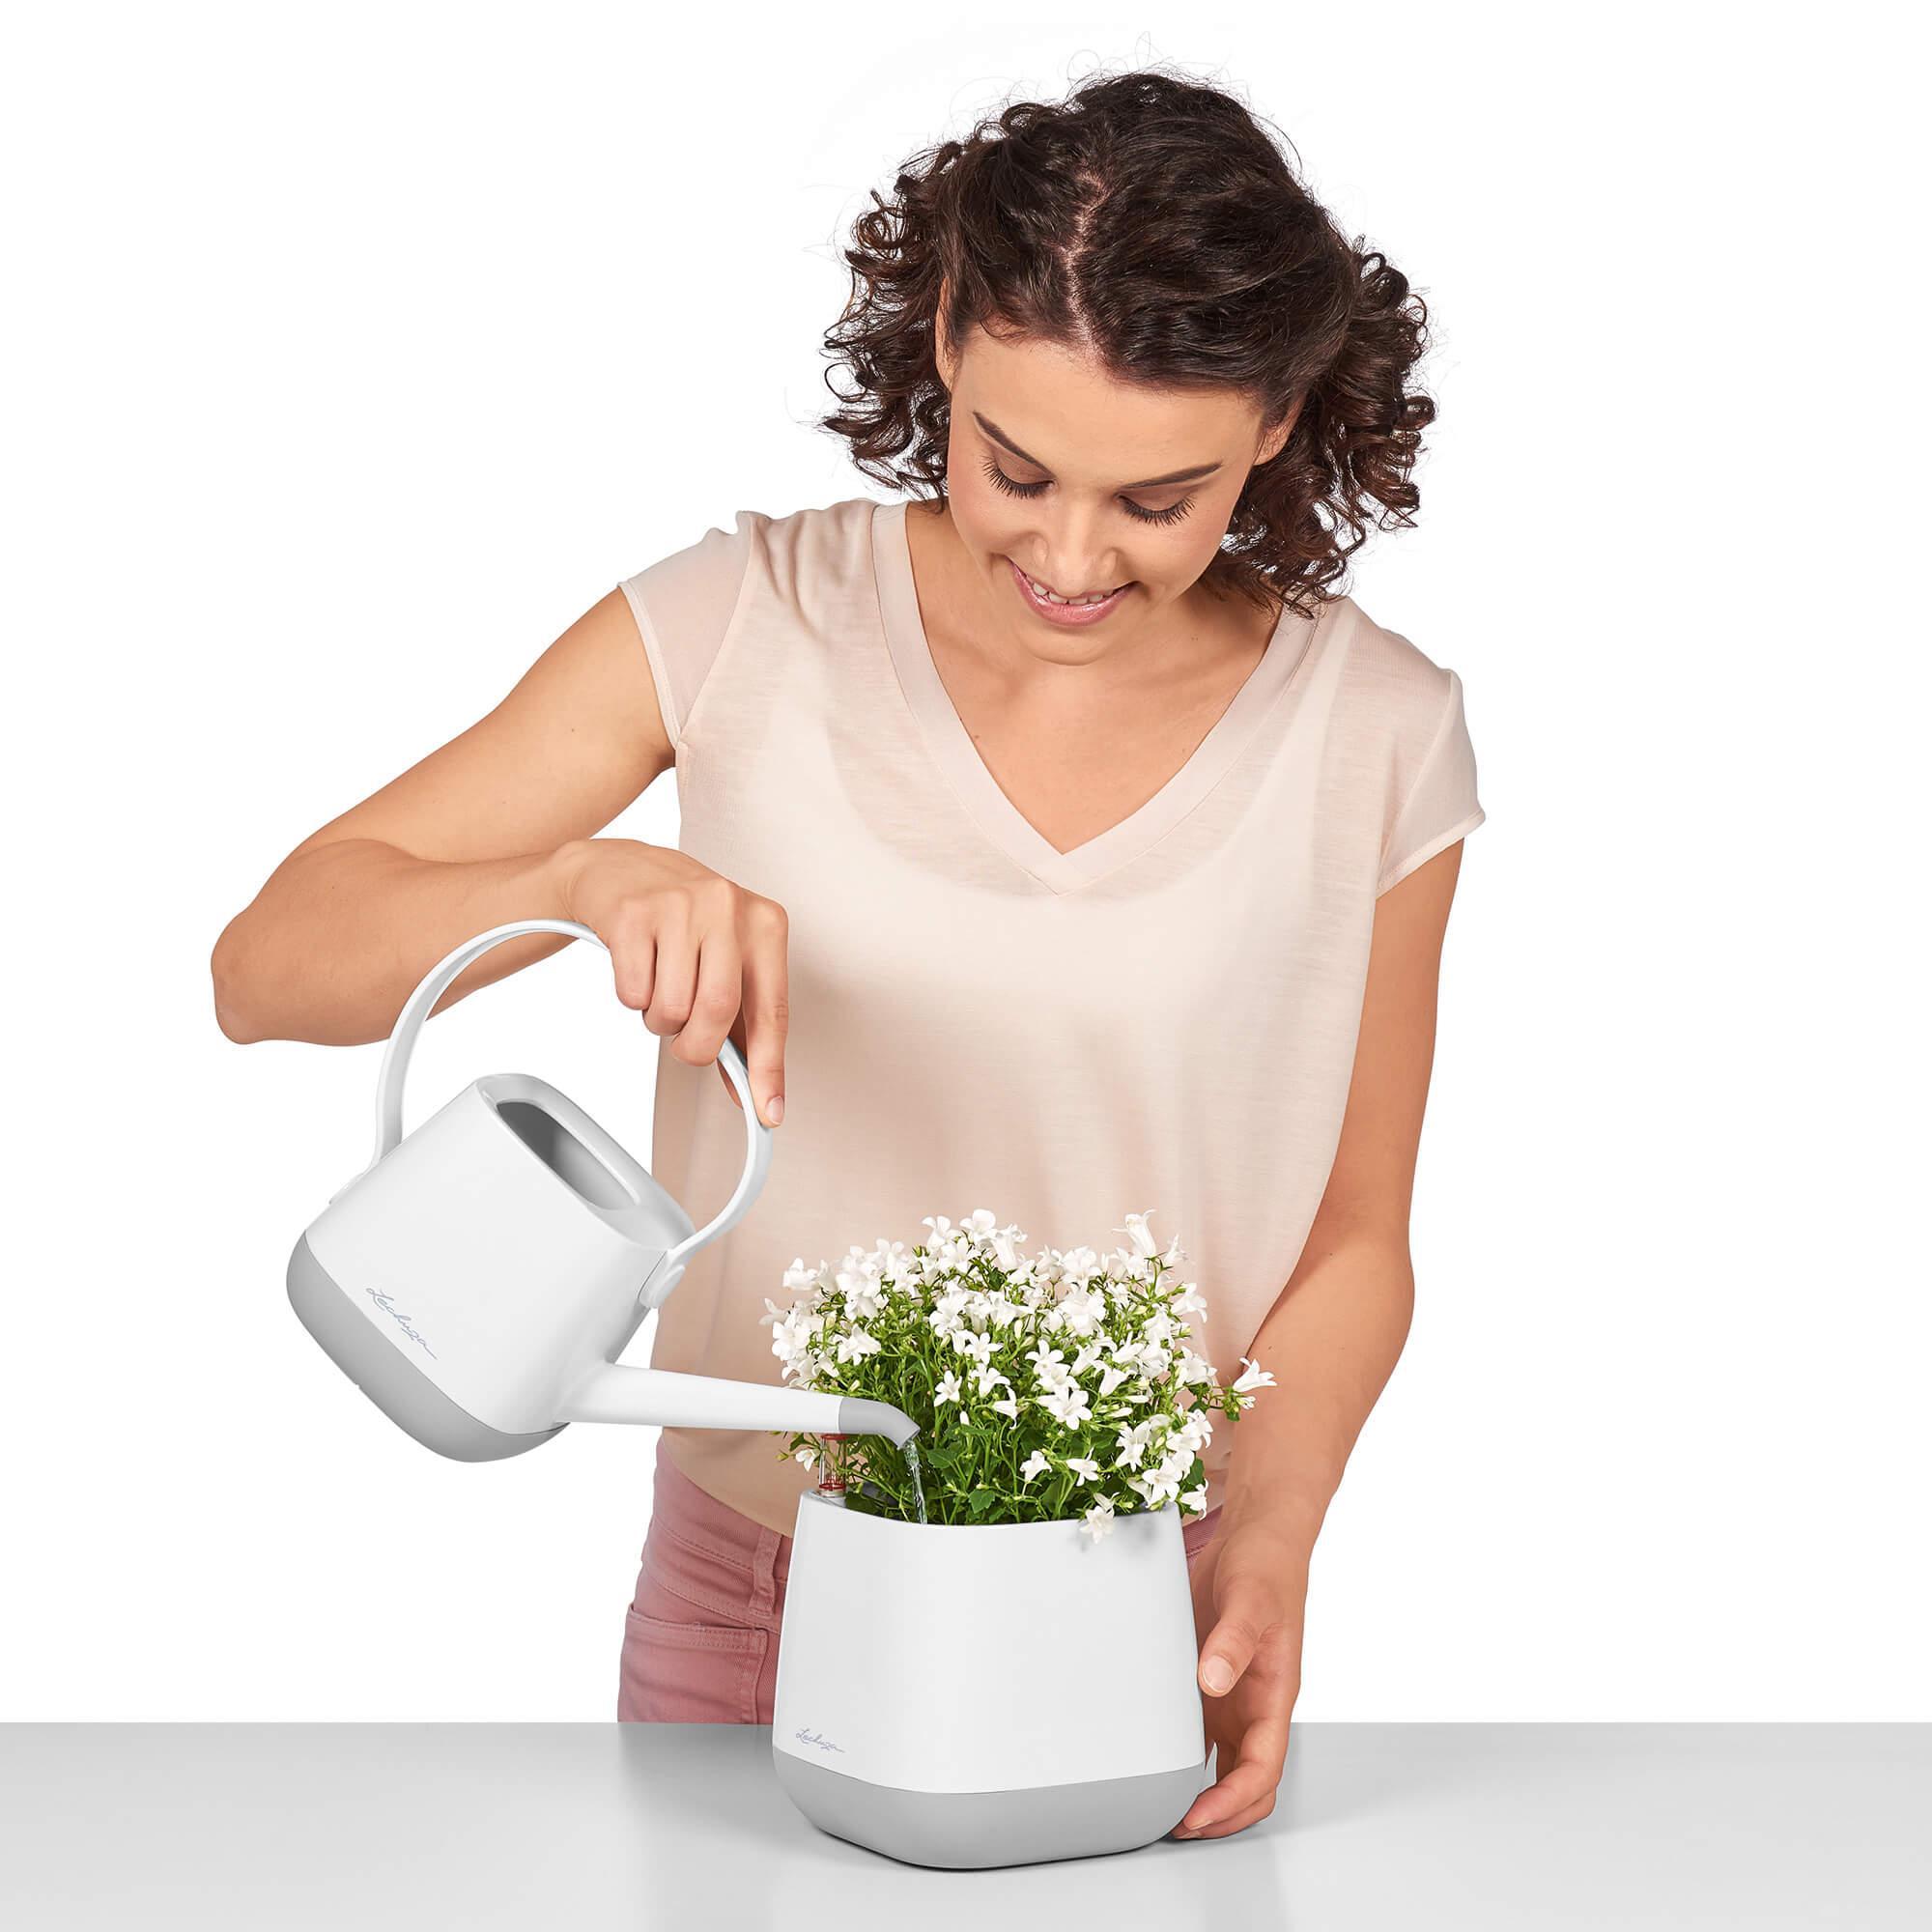 le_yula-pflanzgefaess_product_addi_watering Thumb